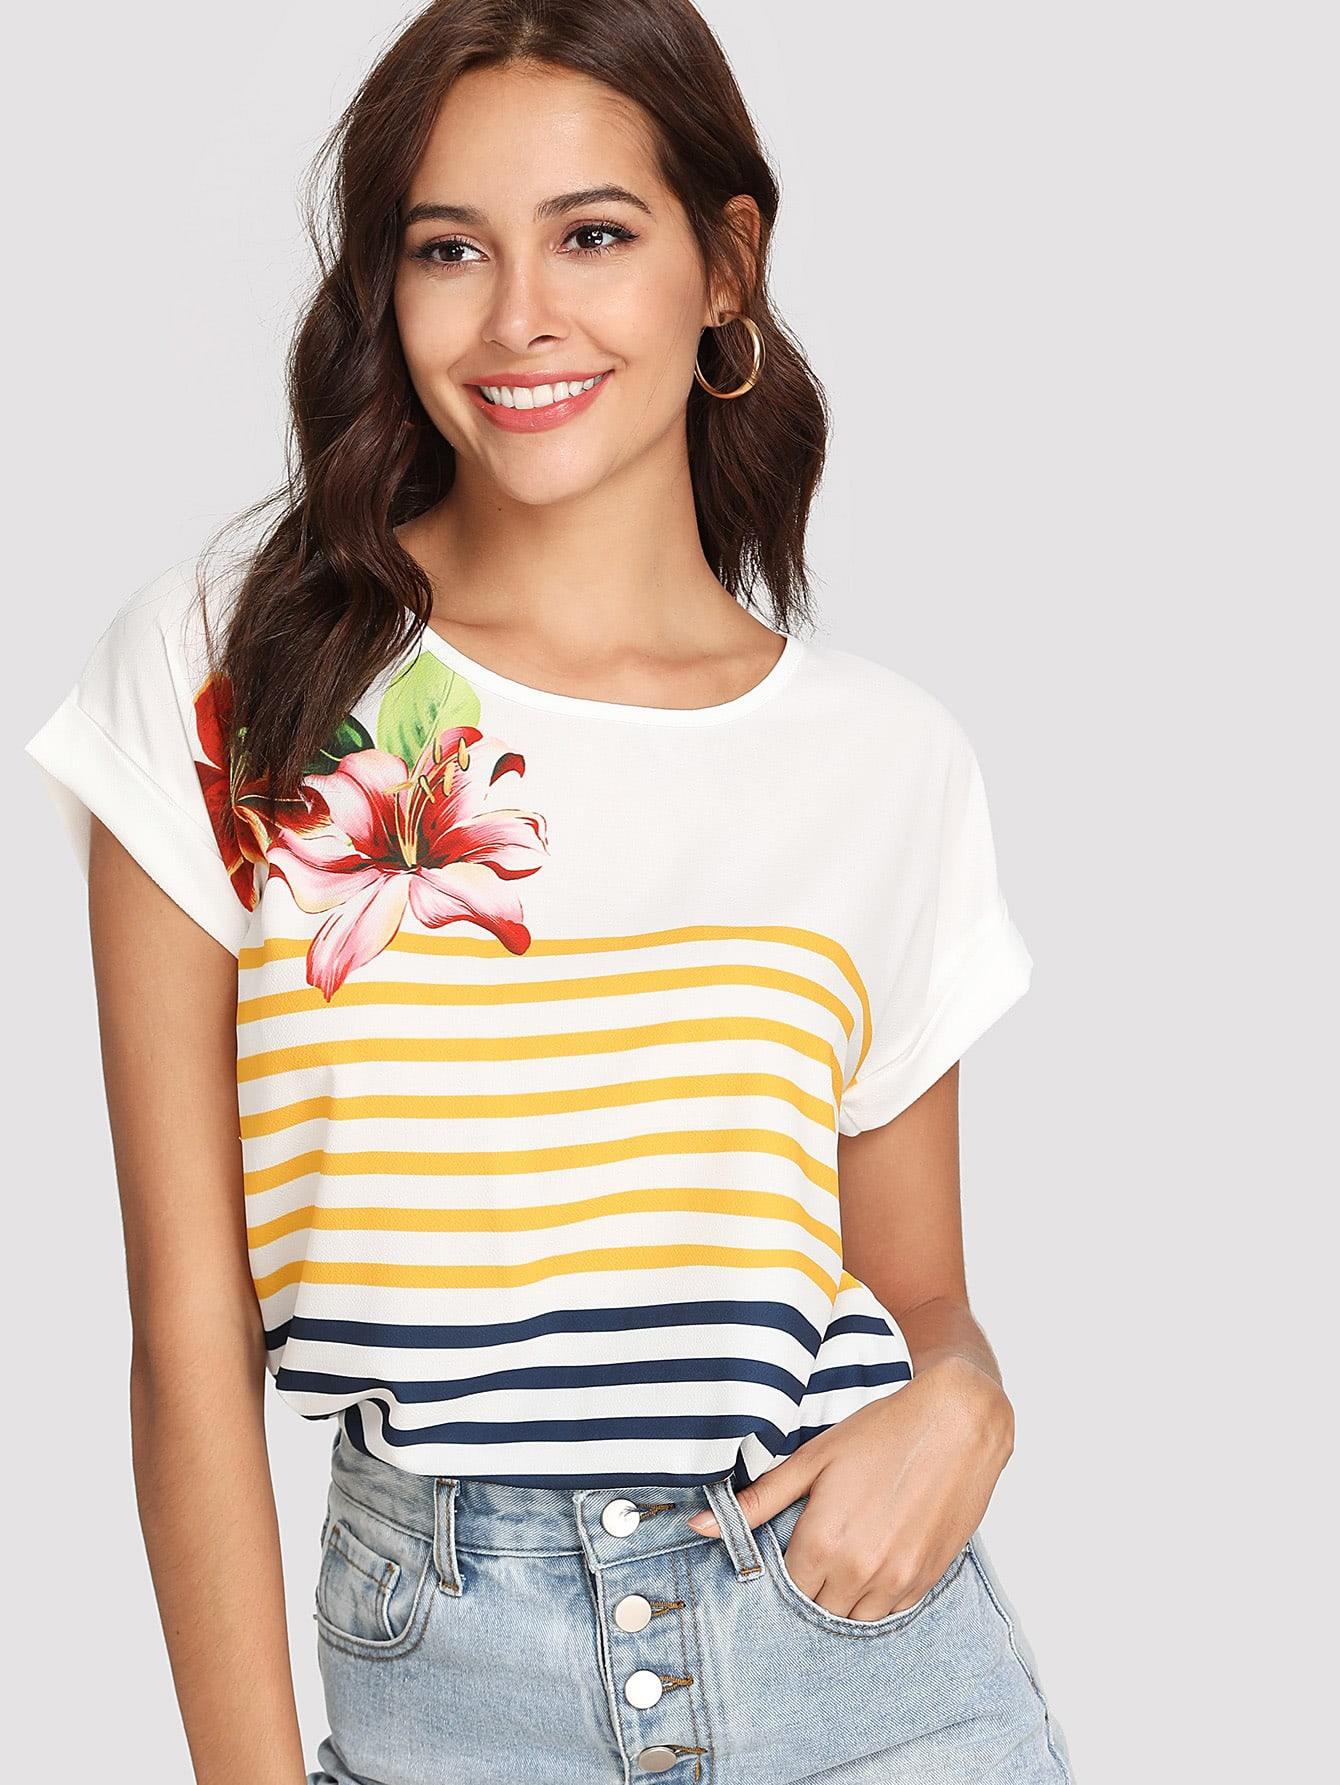 Contrast Striped Floral Print Tee v neckline contrast floral print striped tee